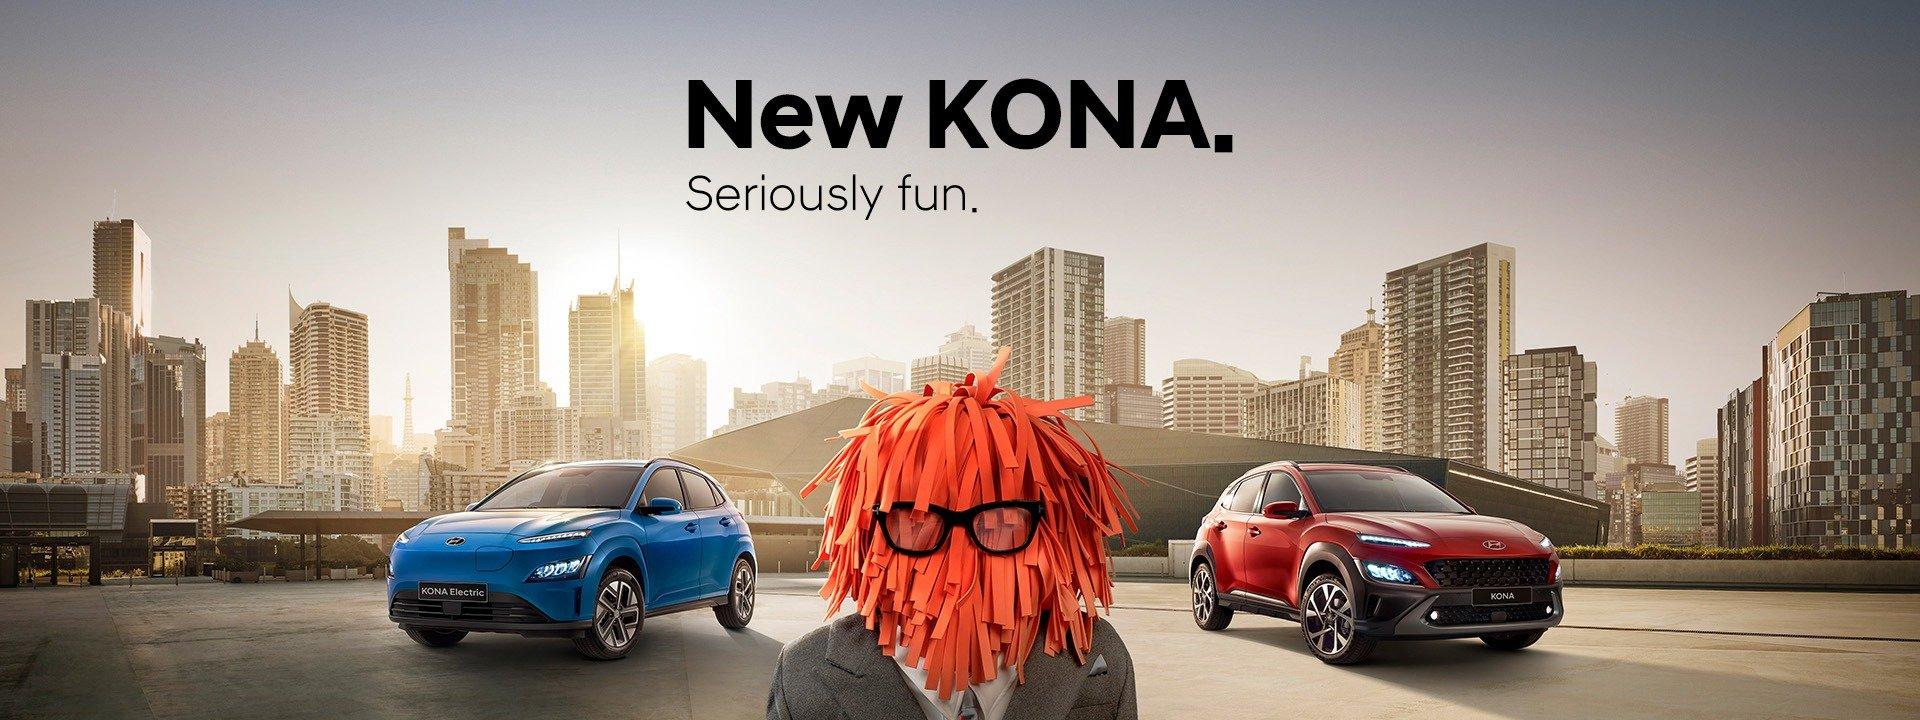 Hyundai-New-KONA